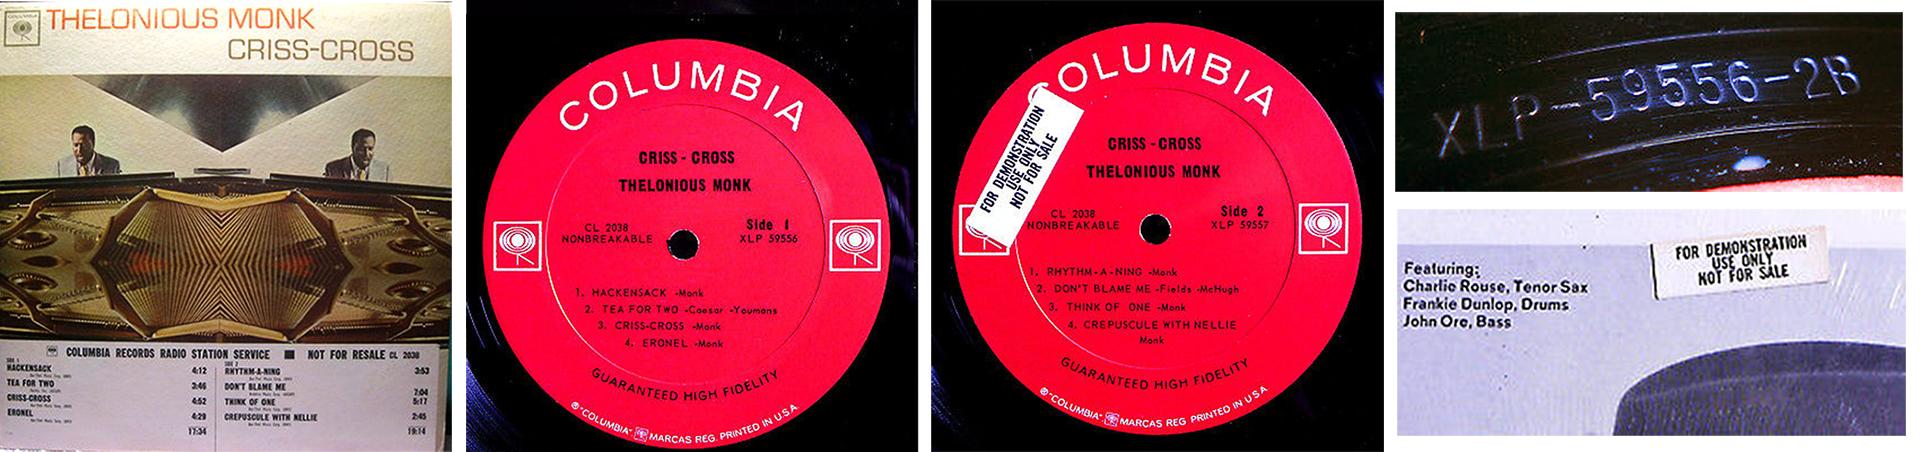 thelonious-monk-criss-cross-Guaranteed-High--Side-1-Fidelity-matrix-mix-2B-